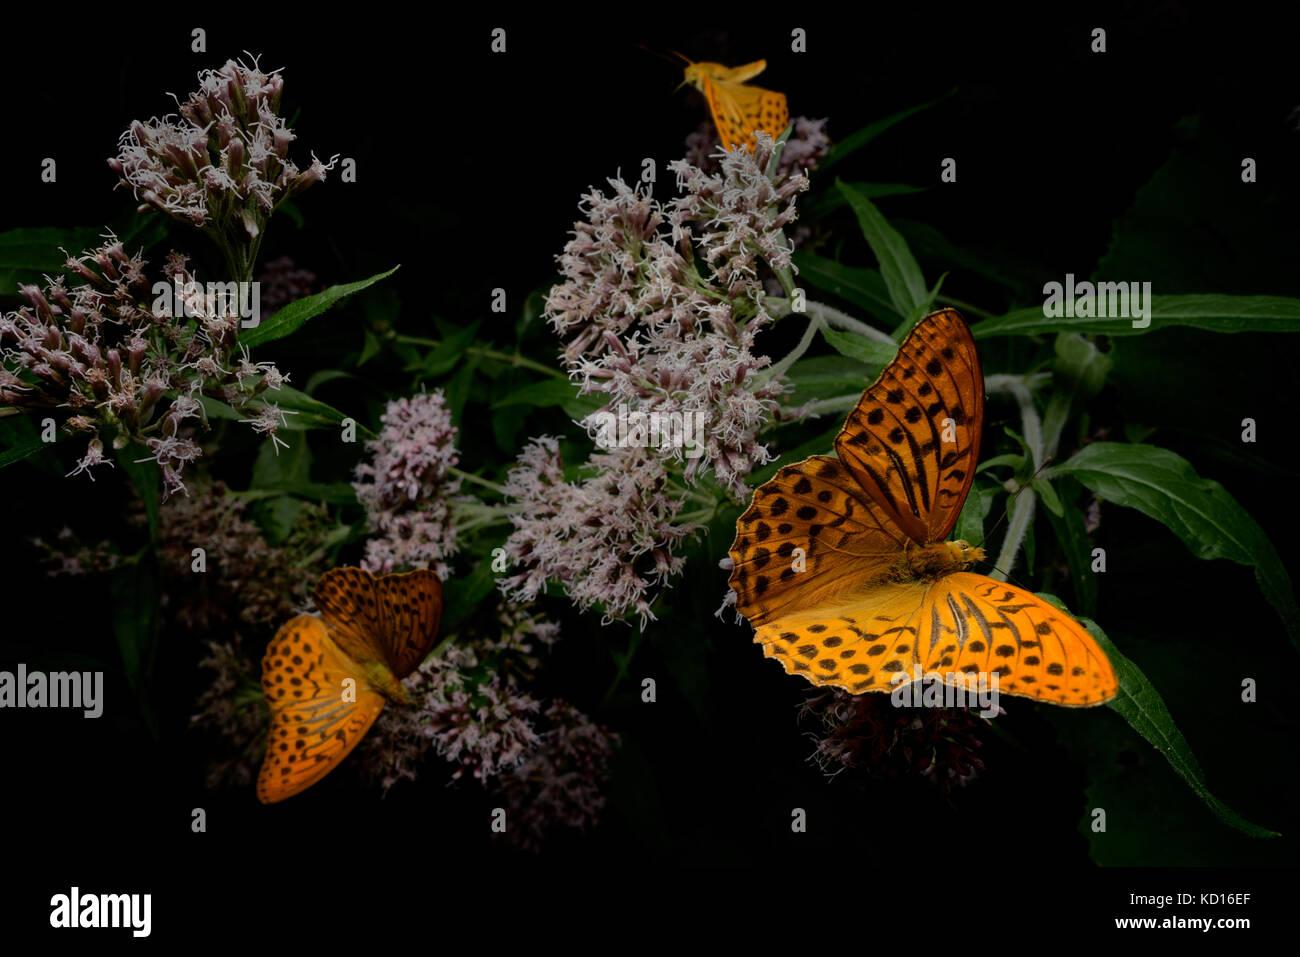 Butterflies on flowers - Stock Image